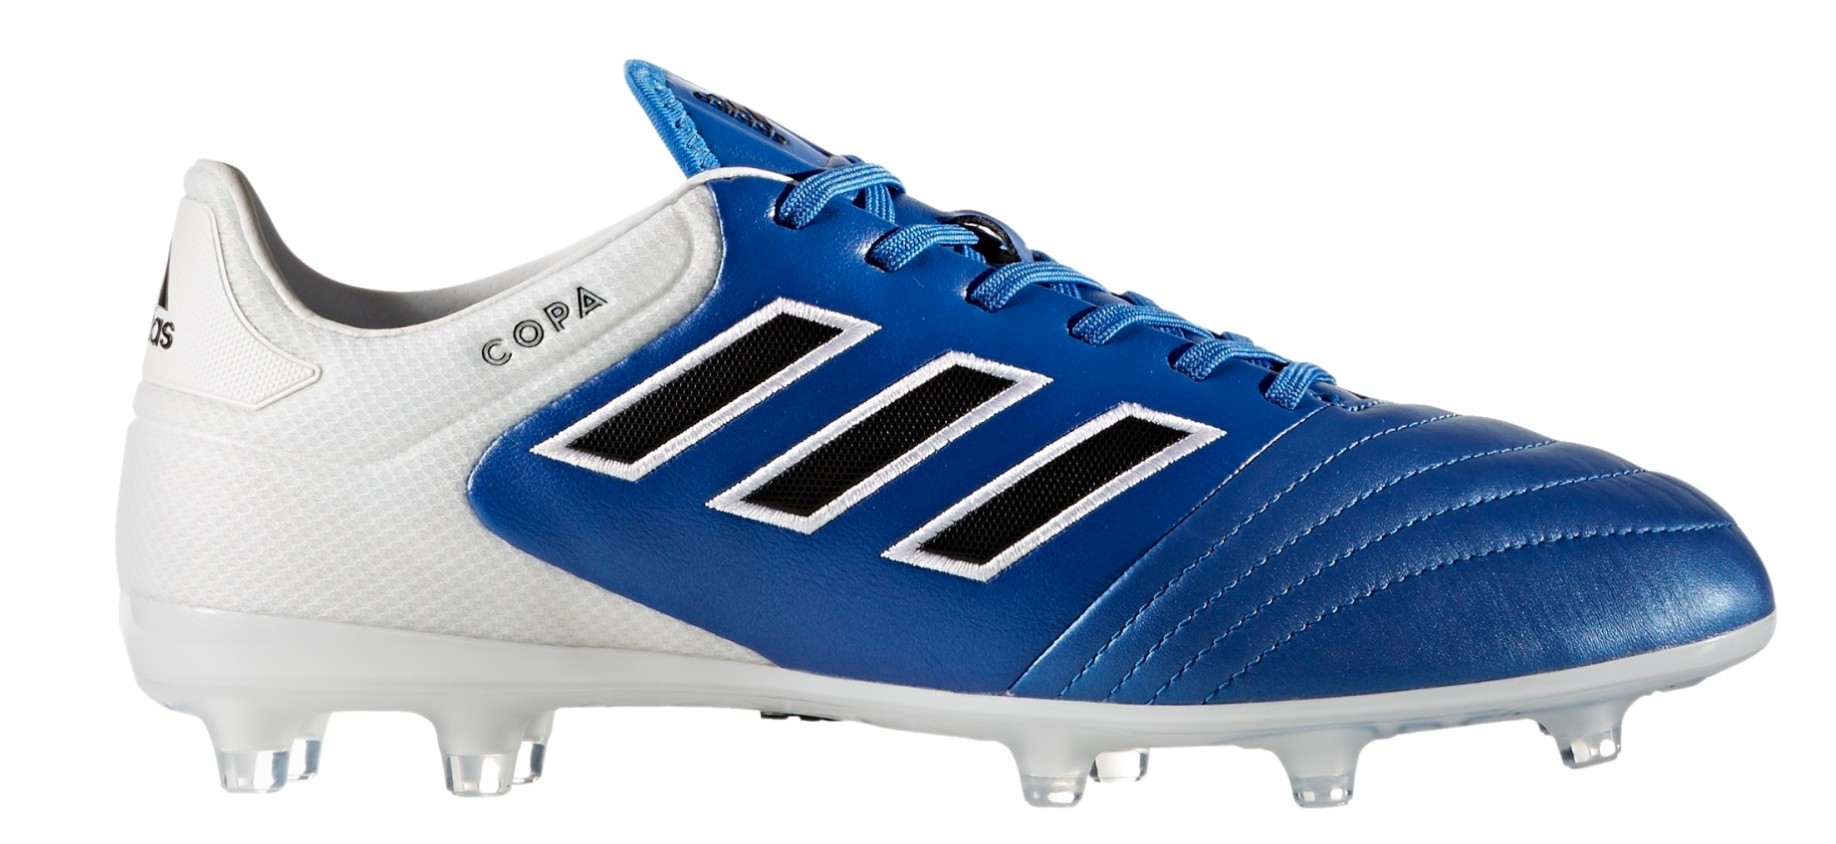 Scarpe Calcio Adidas Copa 17.2 Blue Blast Pack colore Blu Bianco - Adidas - SportIT.com